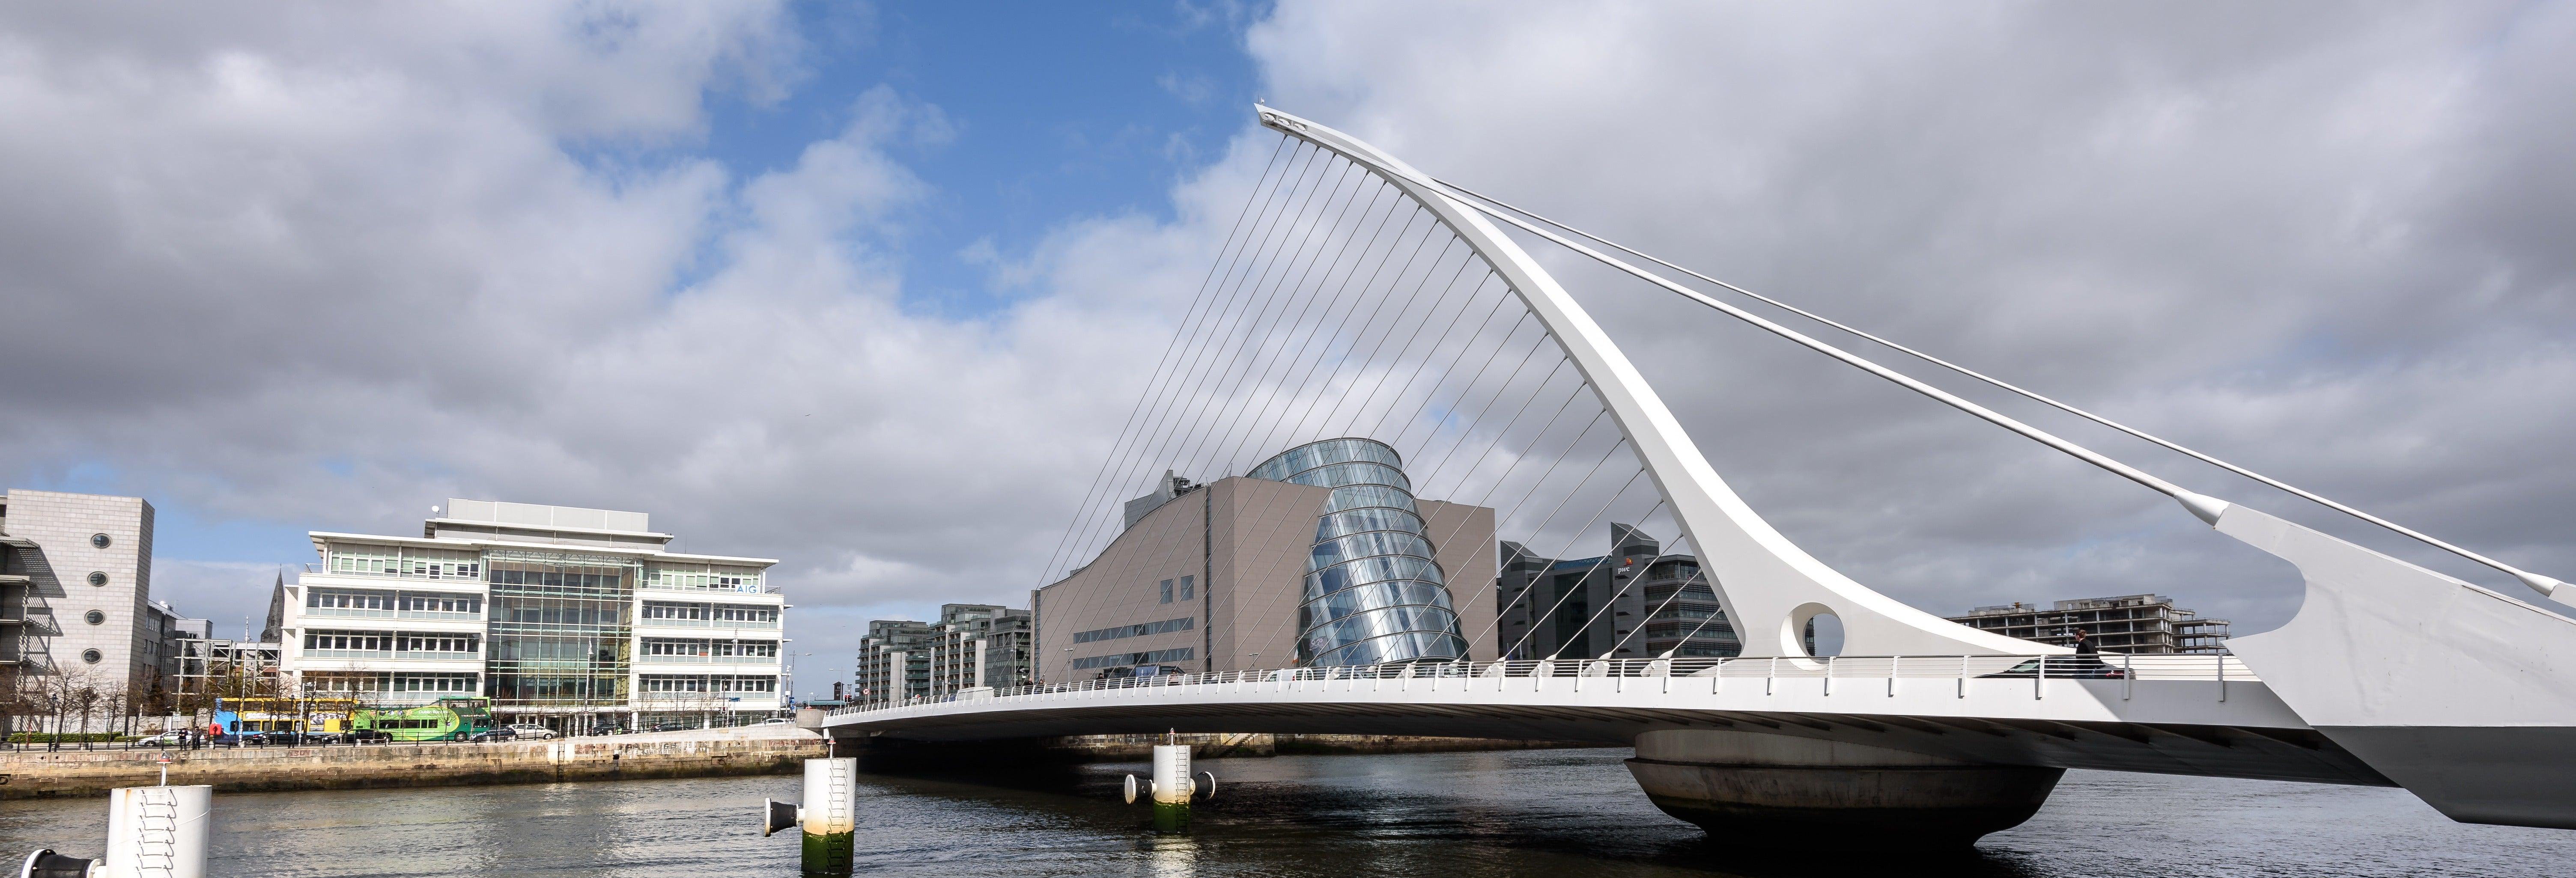 Dublin Private Tour